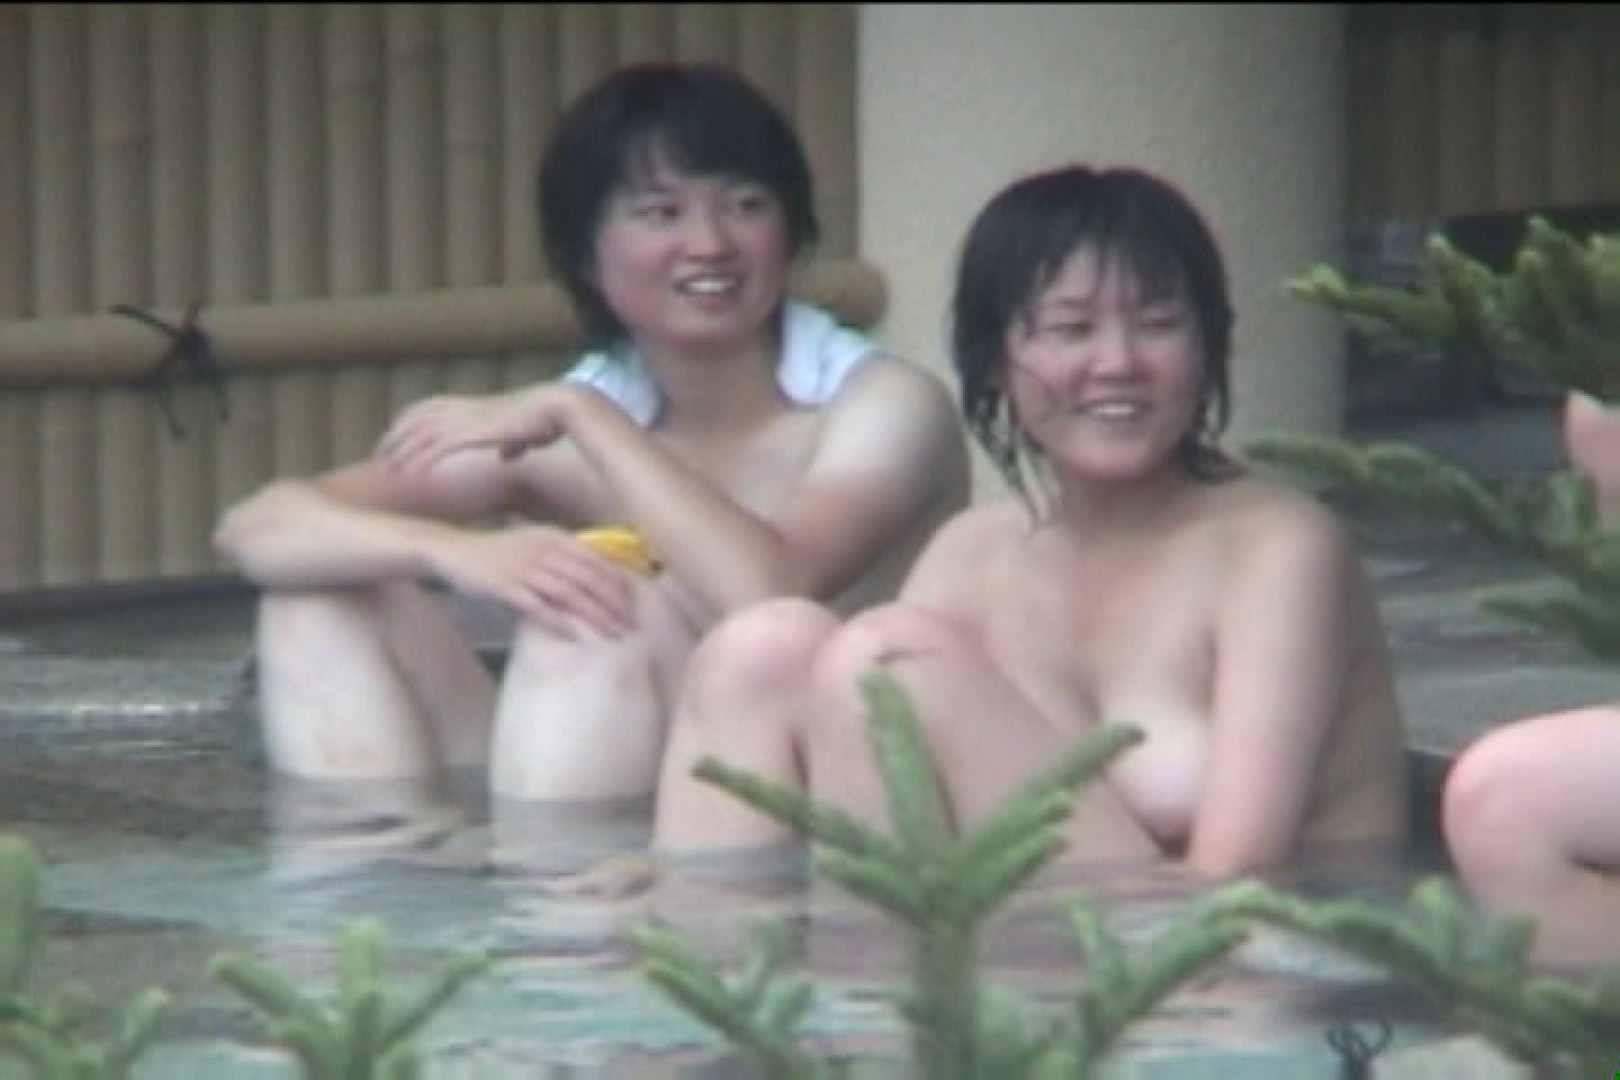 Aquaな露天風呂Vol.99【VIP限定】 露天風呂編 | 盗撮シリーズ  108PIX 59